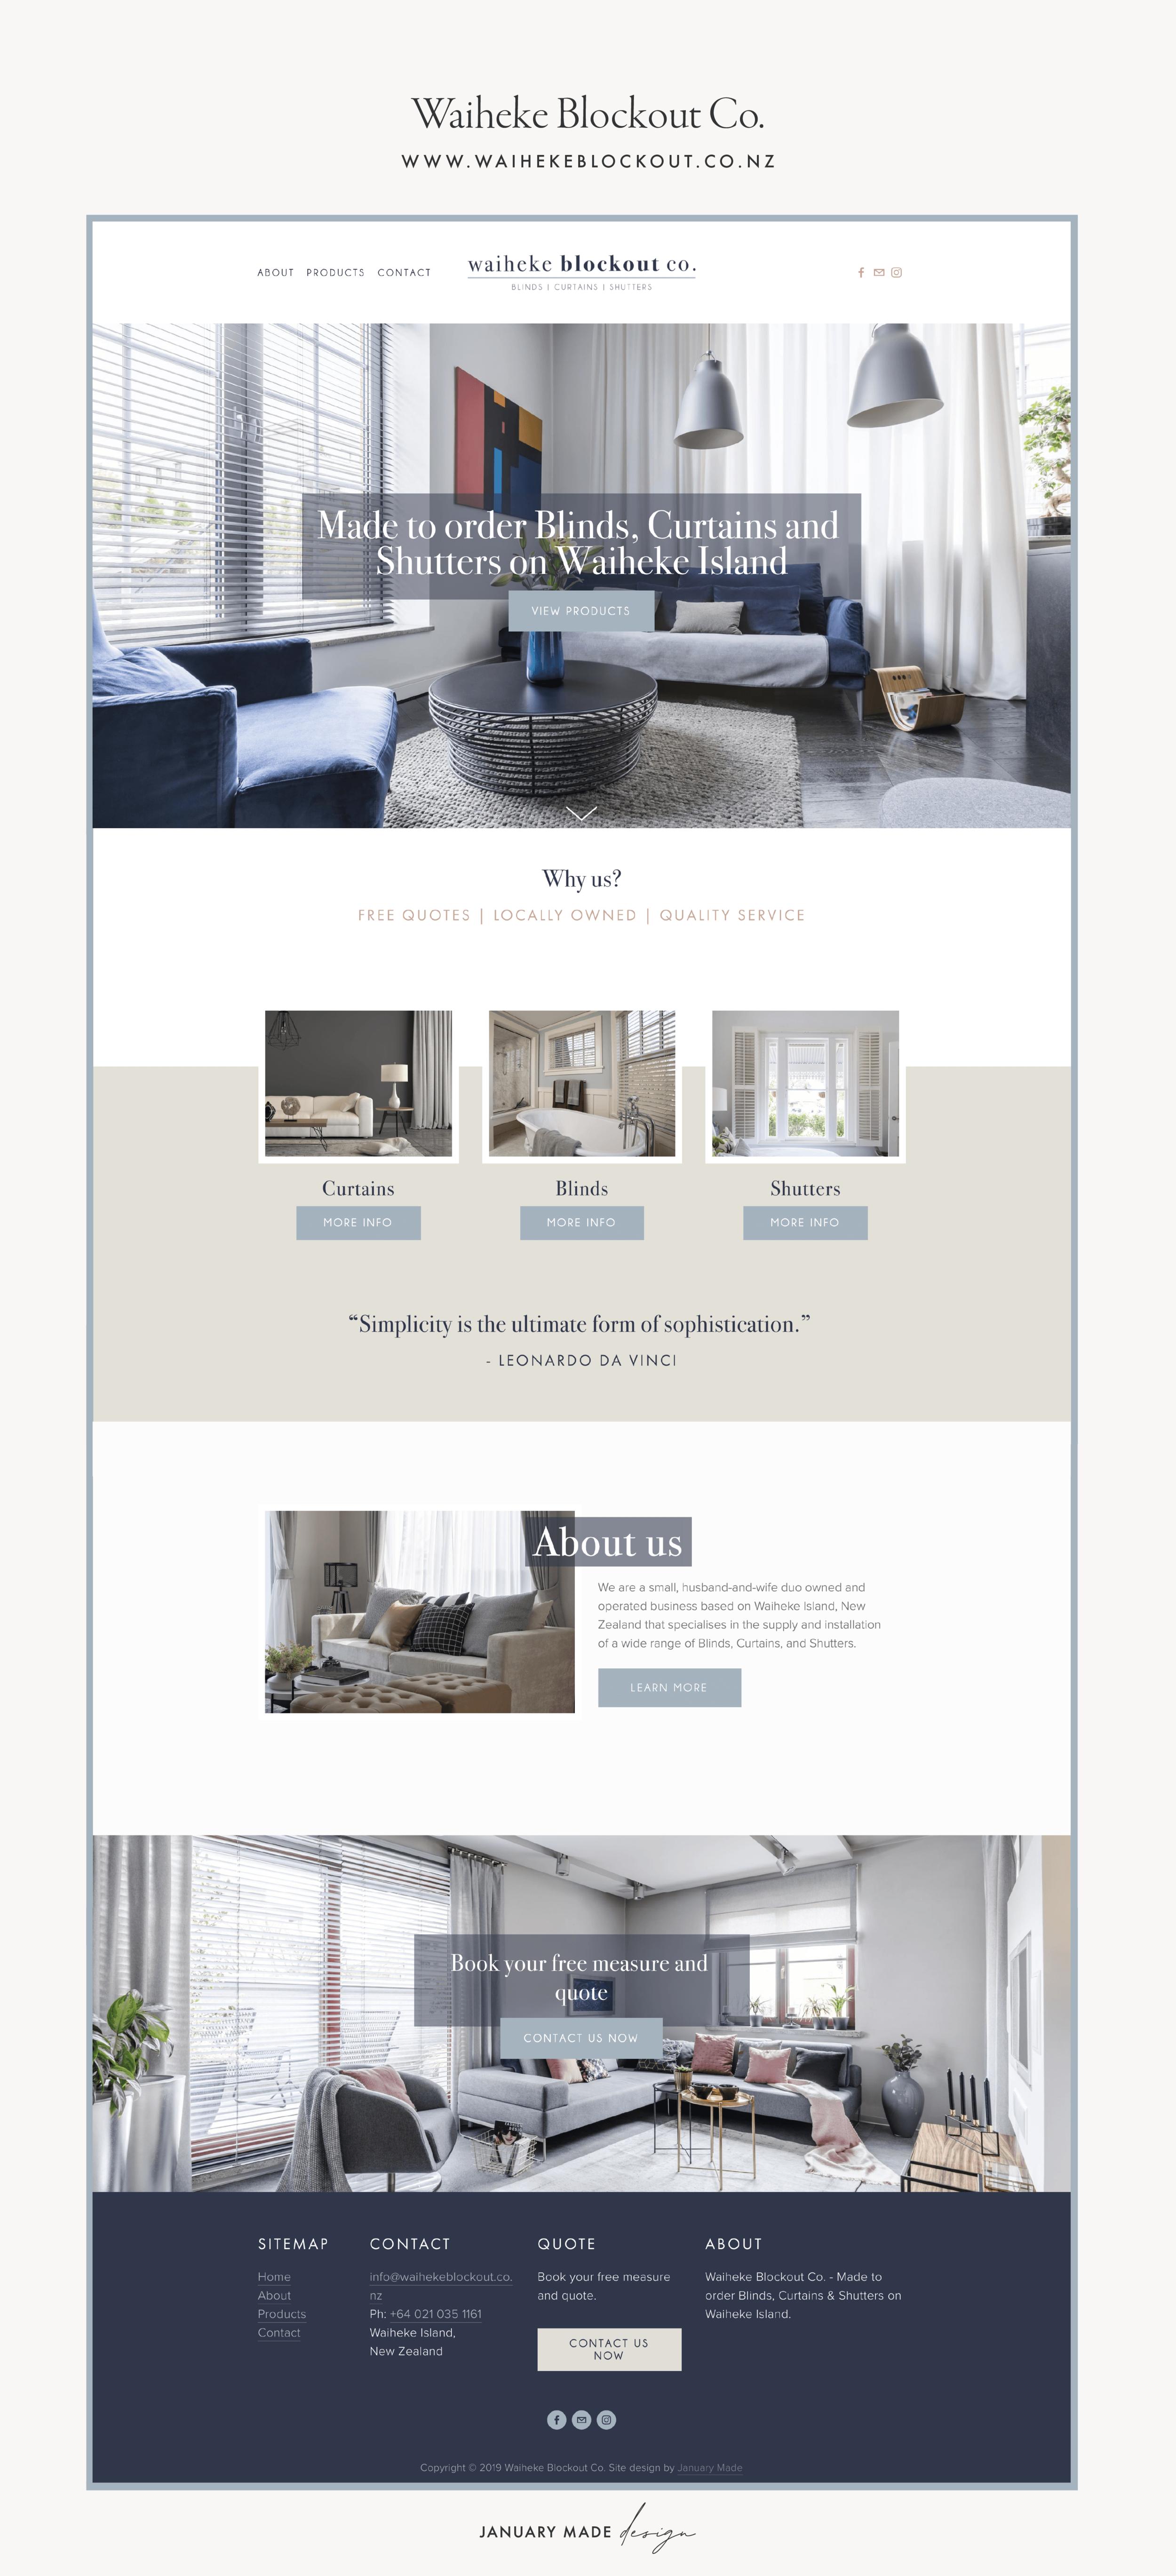 Waiheke Blockout Co. Website by January Made Design